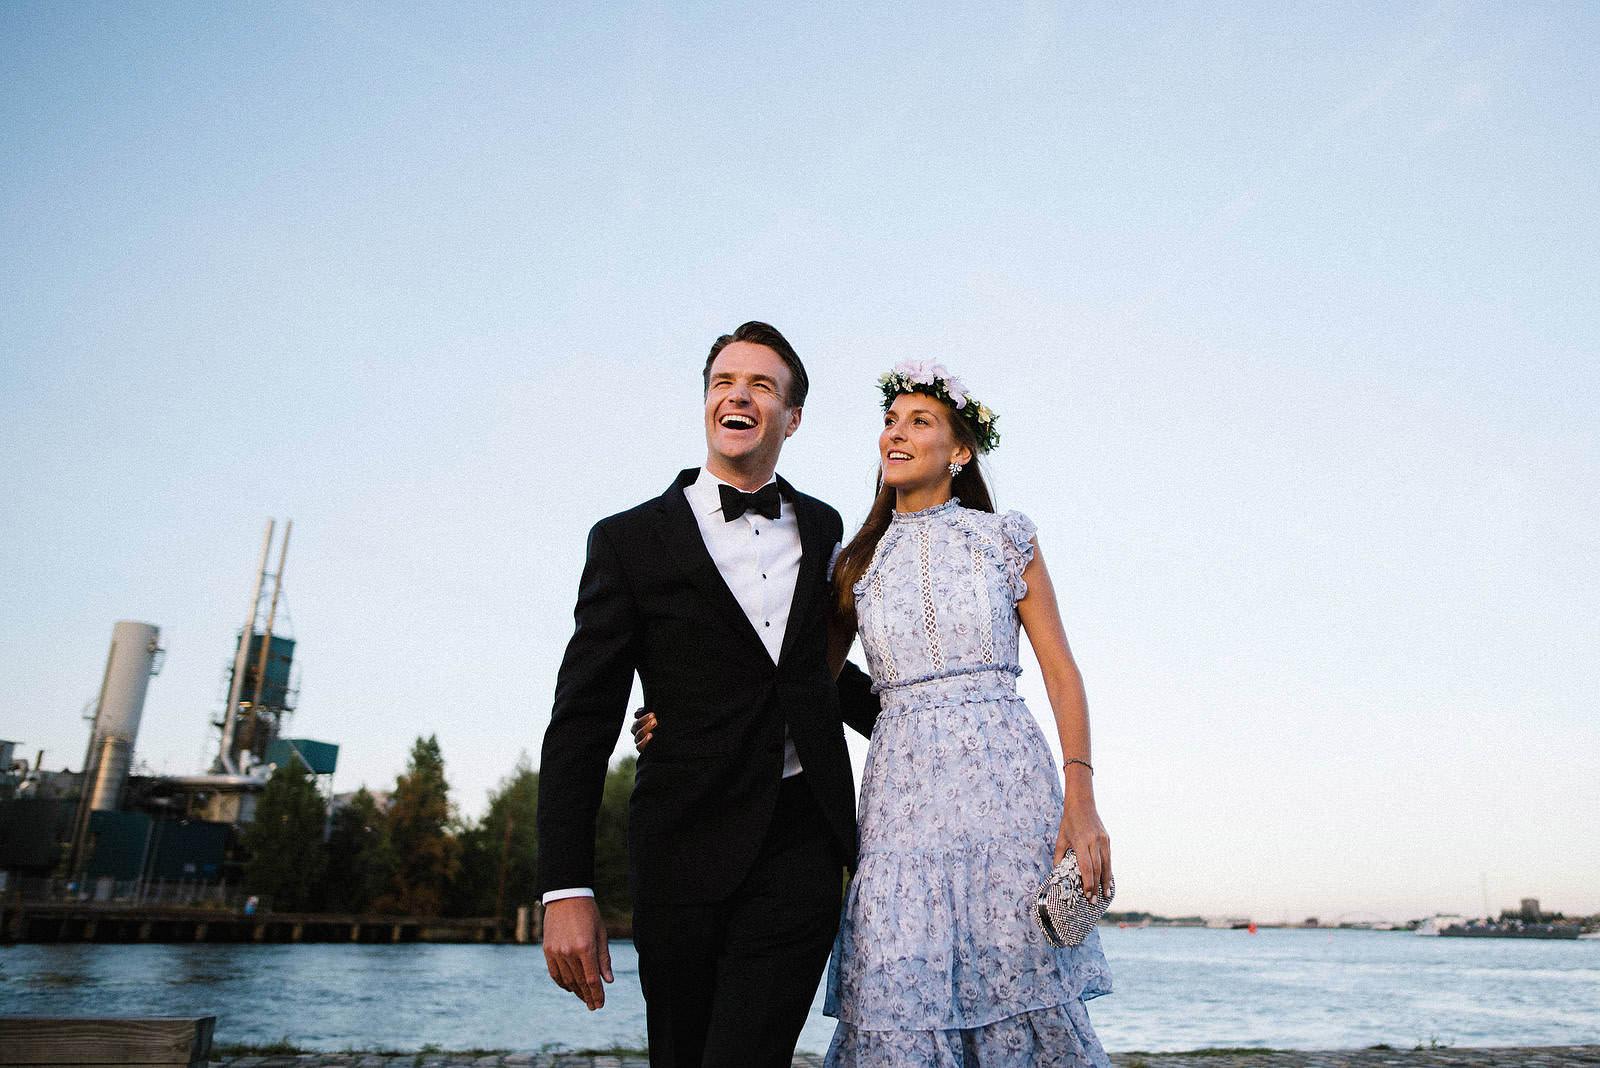 Fotograf Konstanz - Destination Wedding Photographer Amsterdam 112 - Destination Wedding Amsterdam  - 211 -